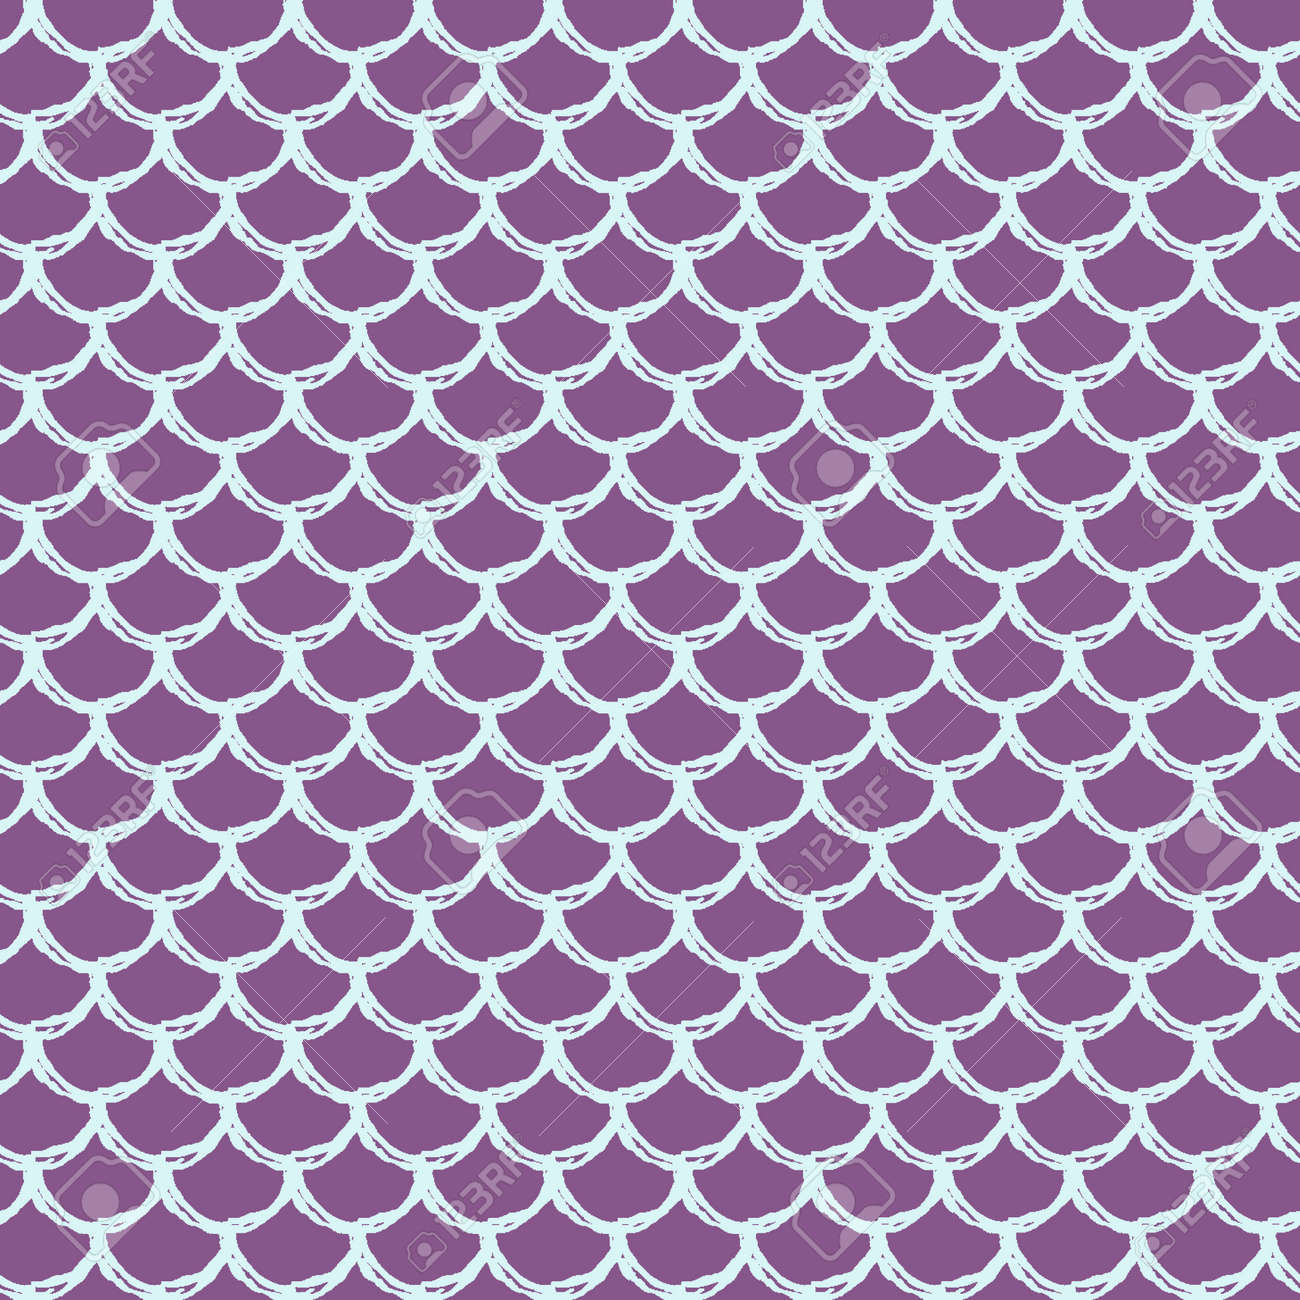 Mermaid Tail Seamless Pattern Fish Skin Texture Tillable Background